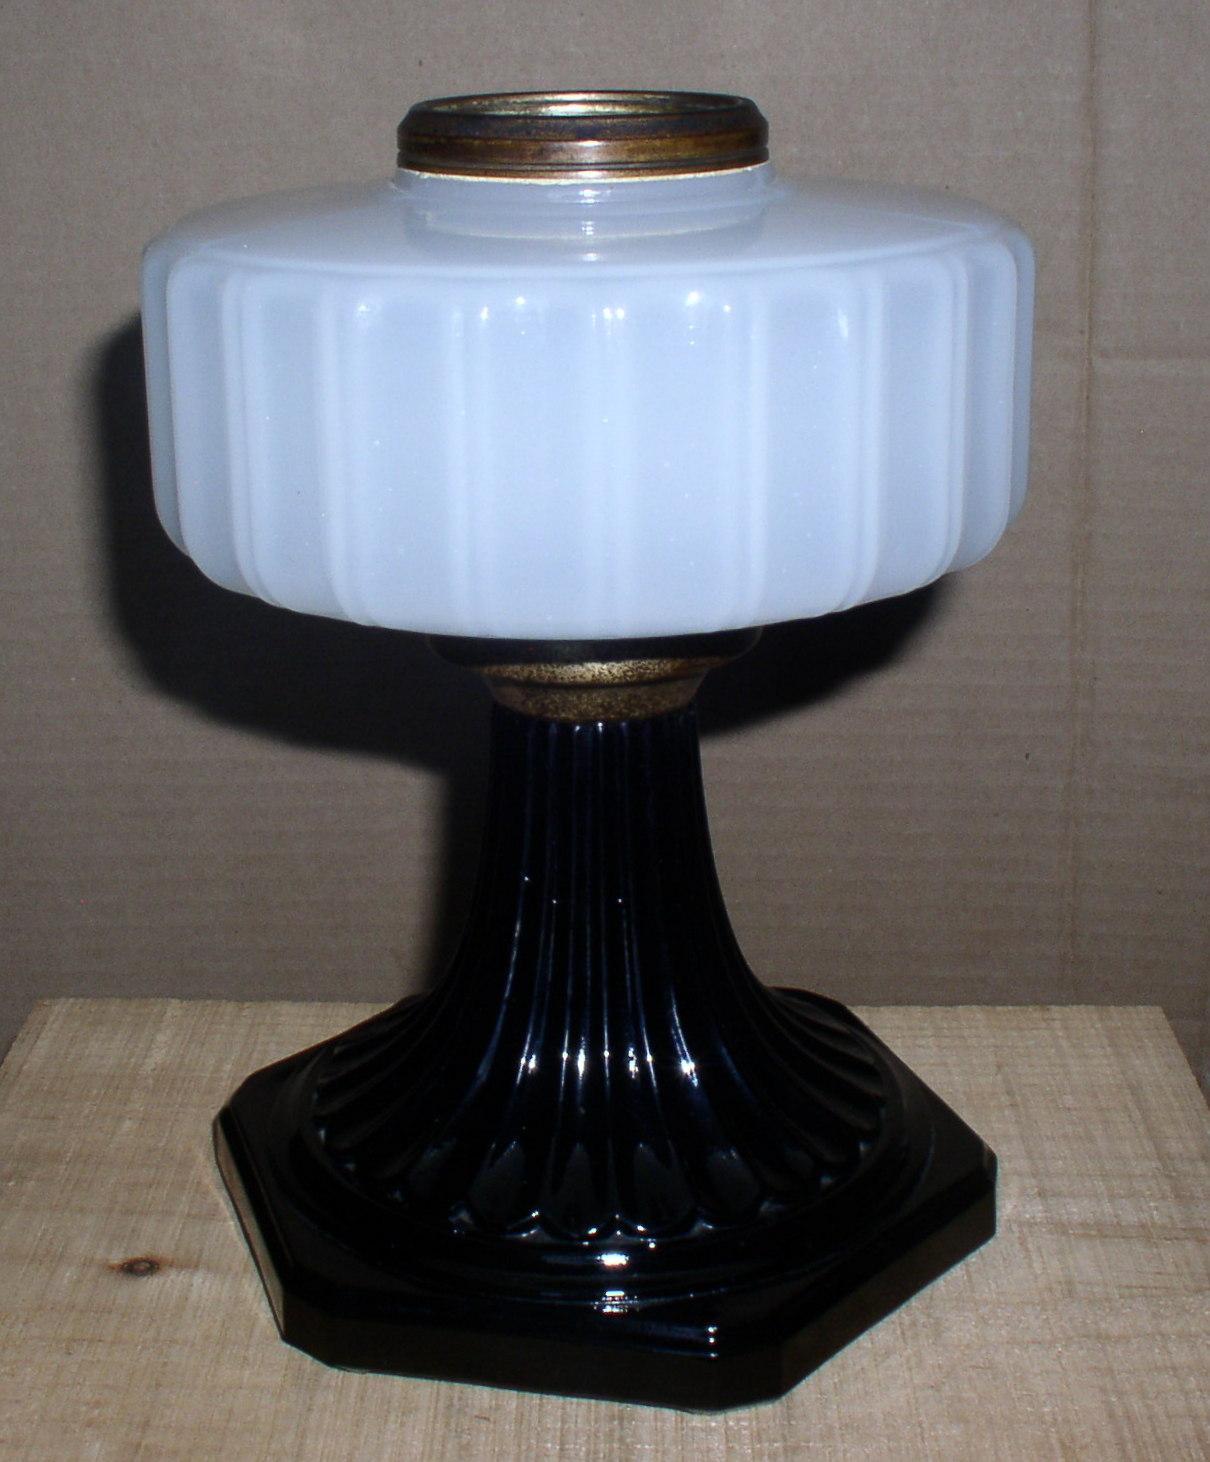 1936 Aladdin Corinthian Kerosene Oil Lamp White Font Black